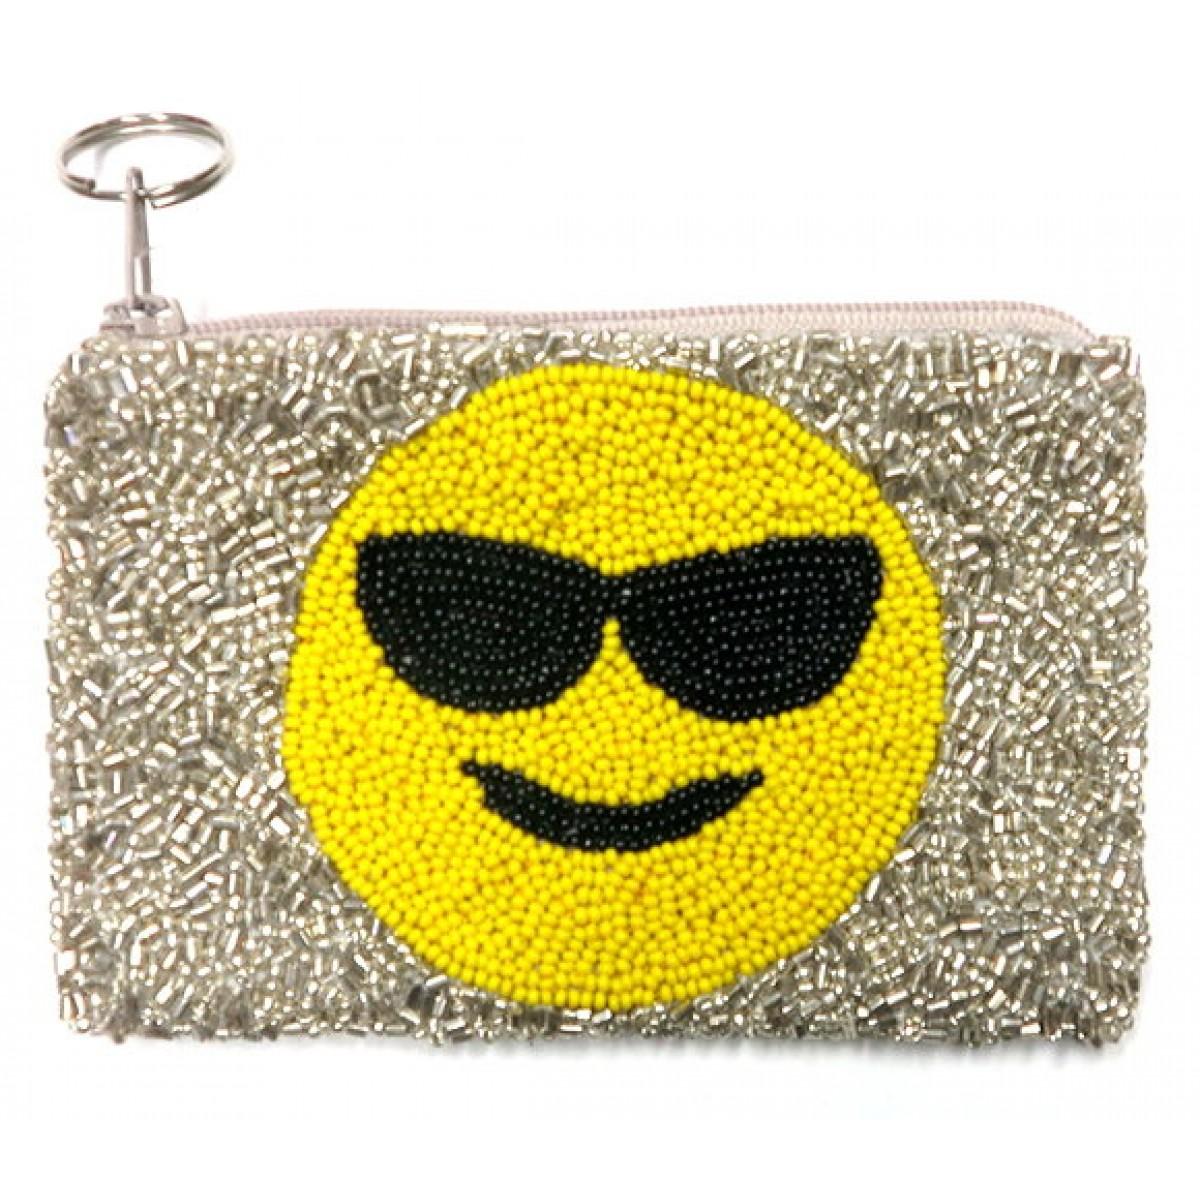 Sunglasses Emoji Coin Purse